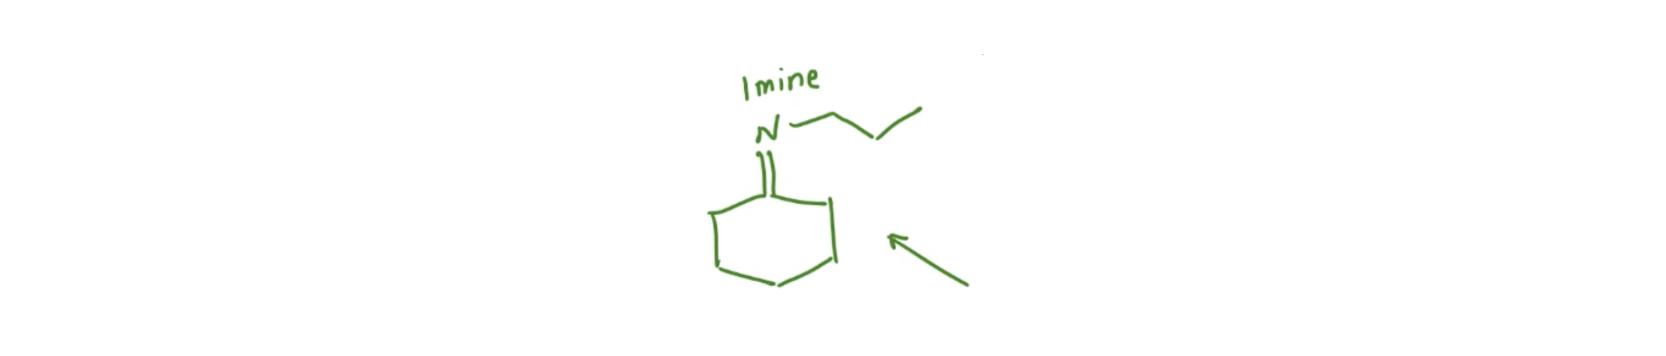 Imine-Structure